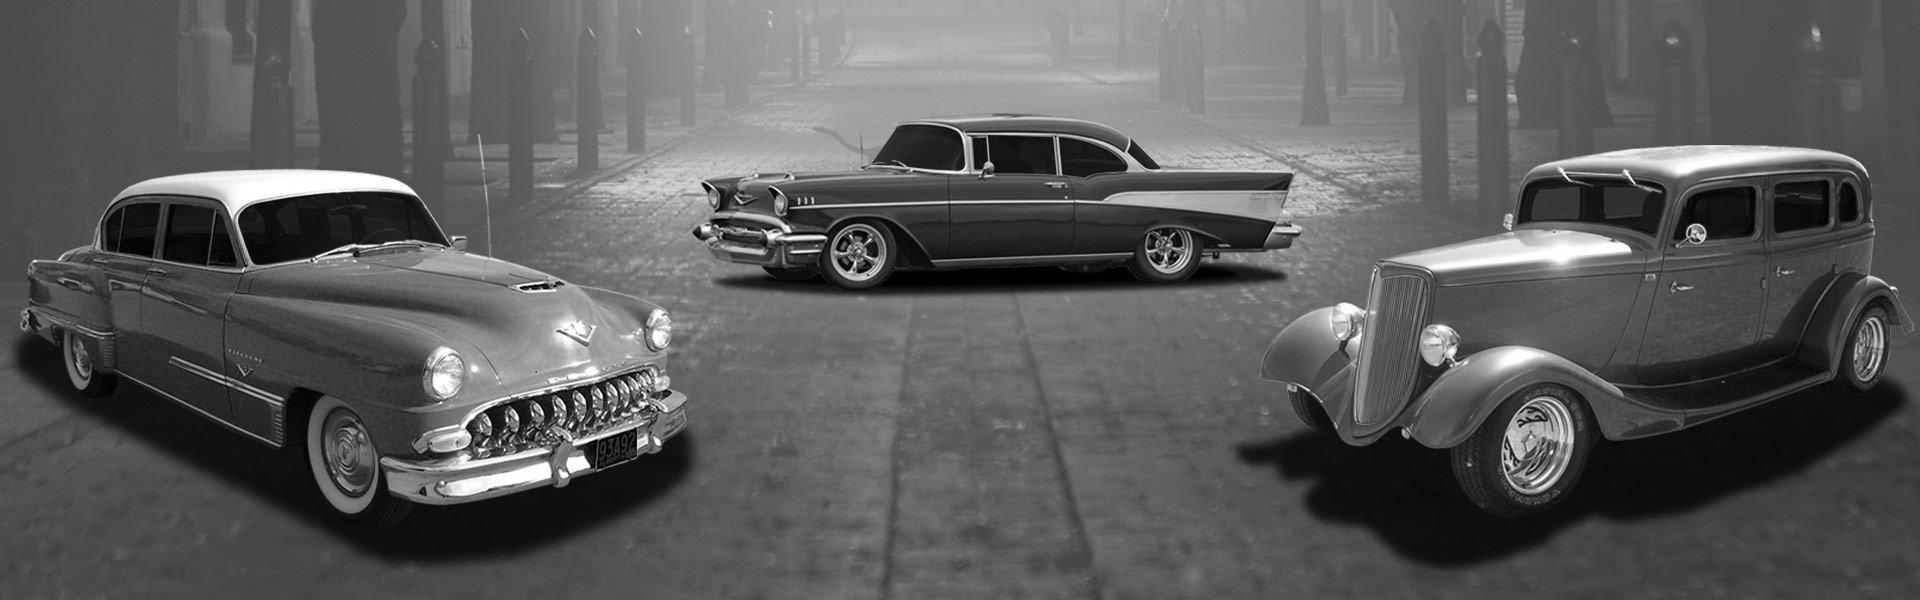 KC Vintage Cars – Car Dealer in Kansas City, MO